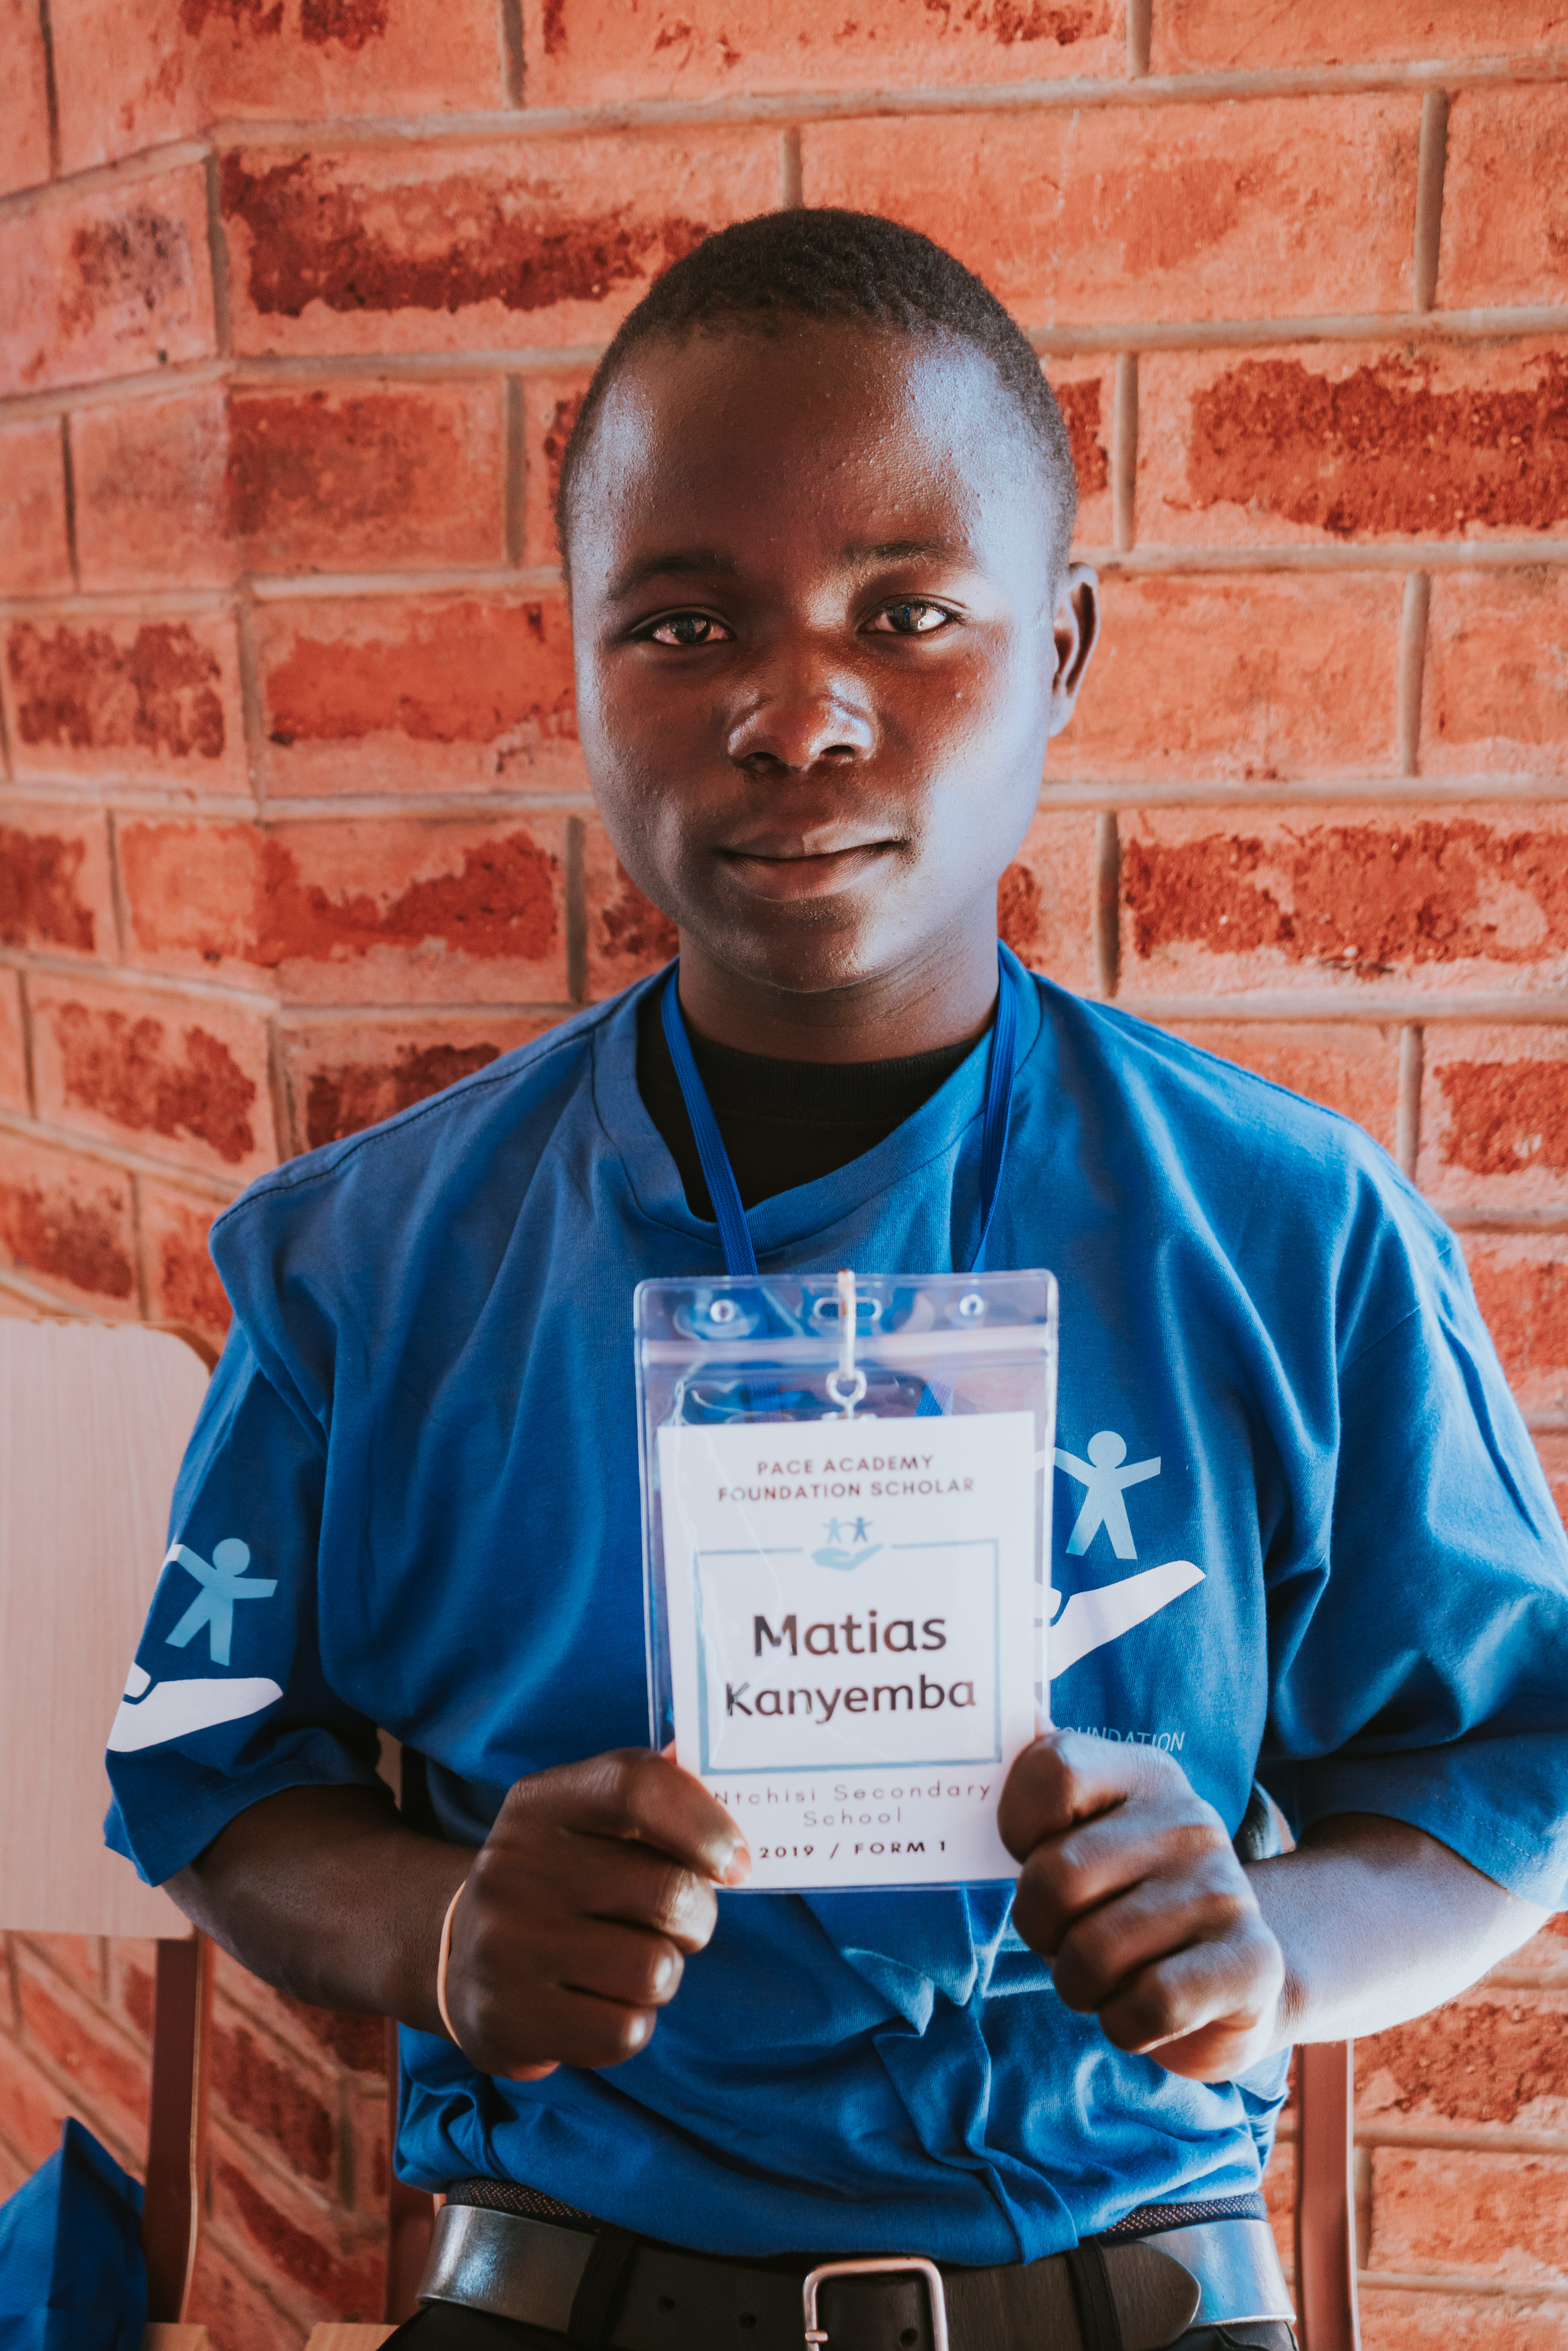 Matias Kanyemba (Ntchisi Secondary Schoo